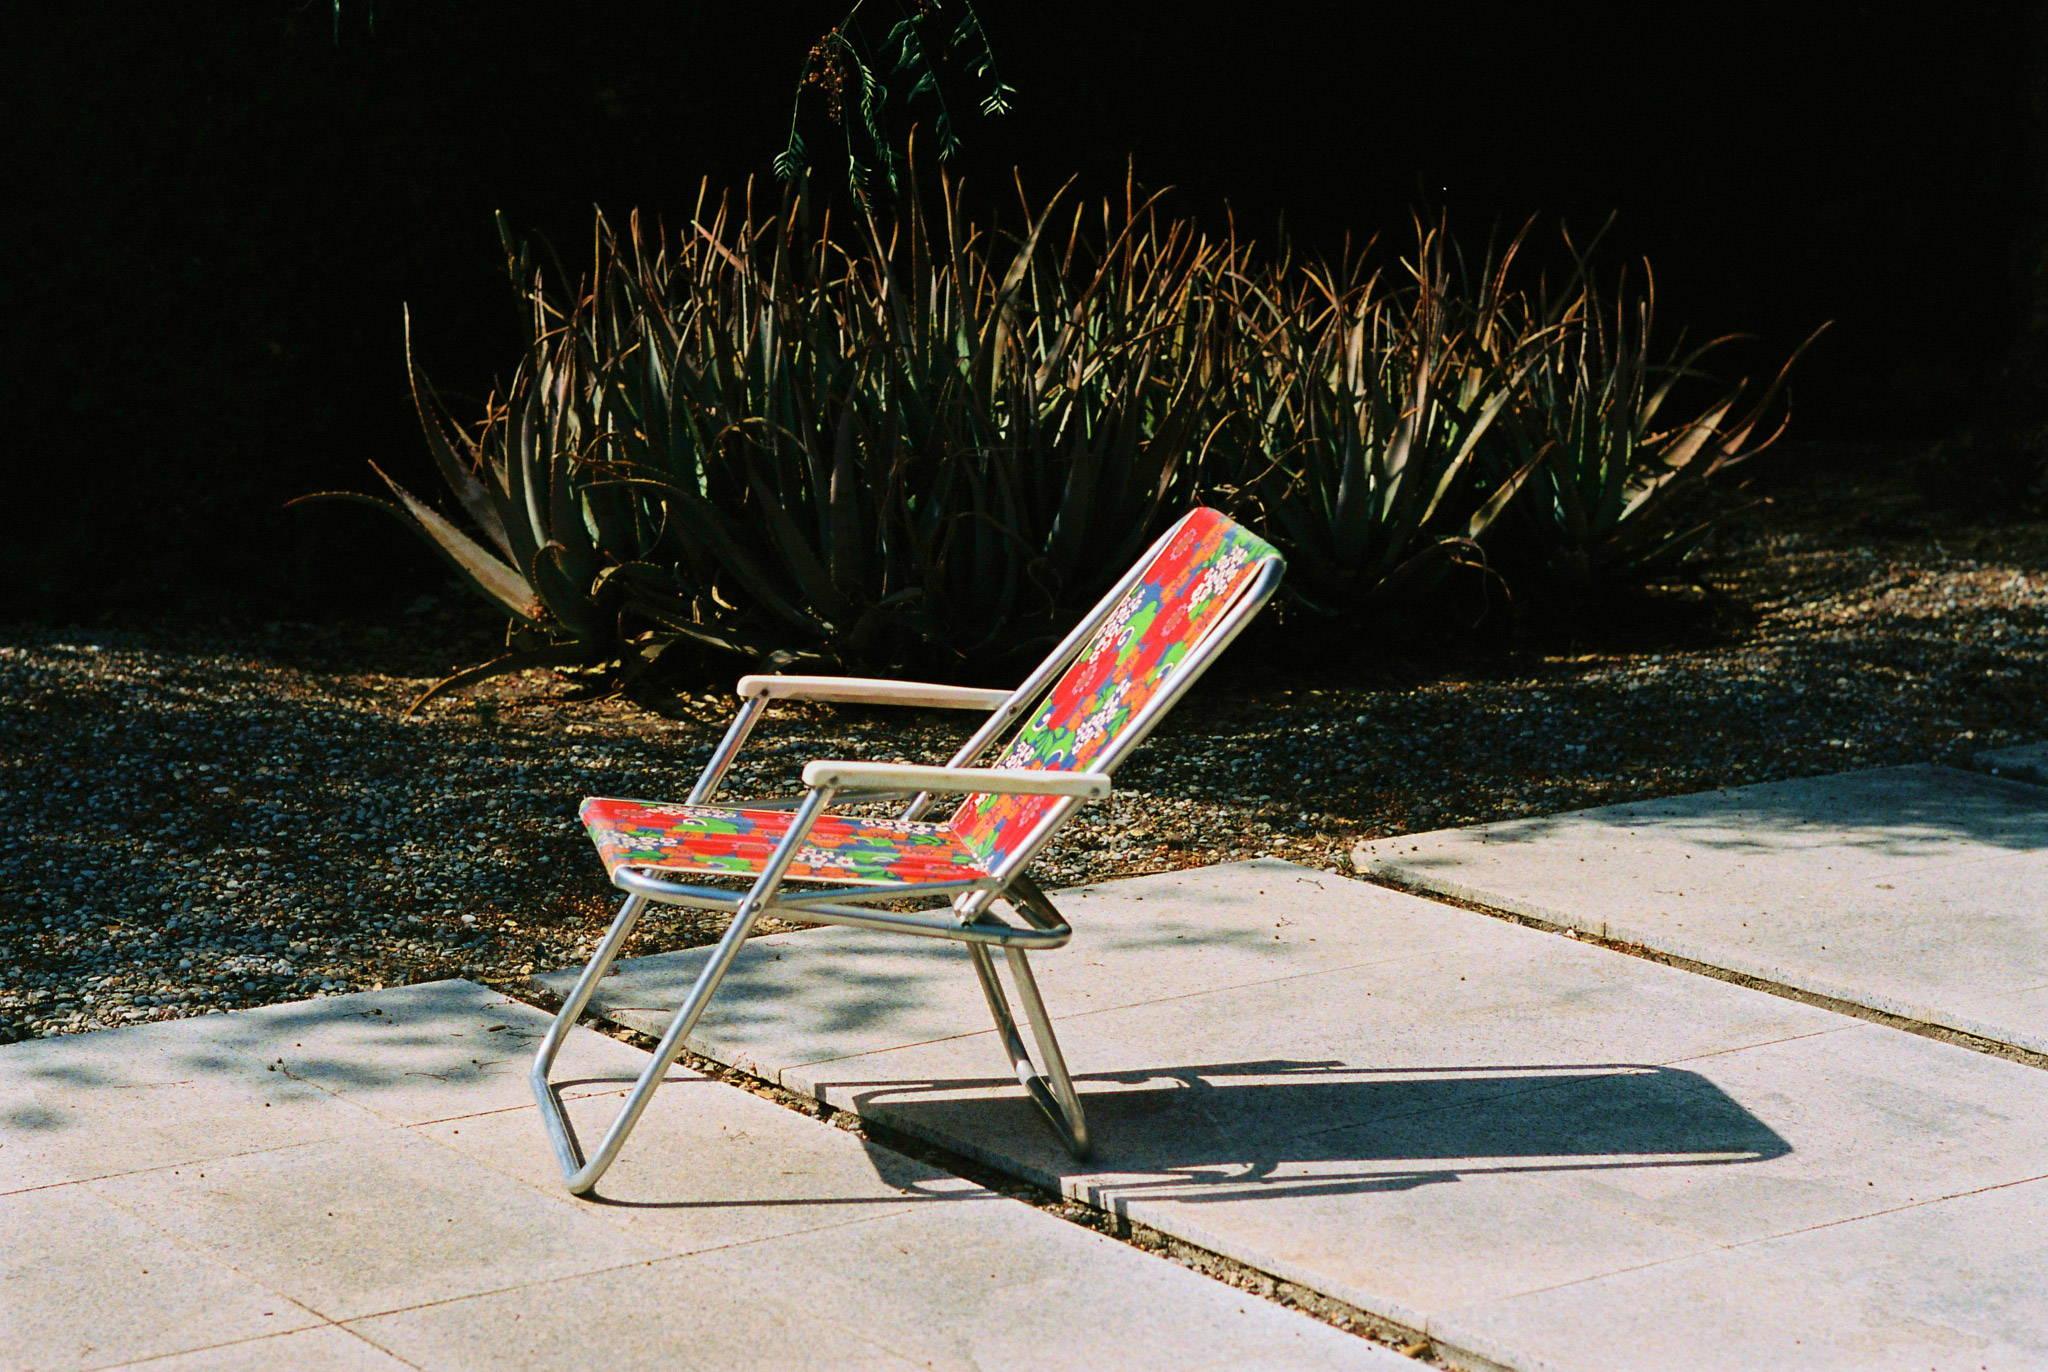 Deck chair waiting for Loah beer drinker